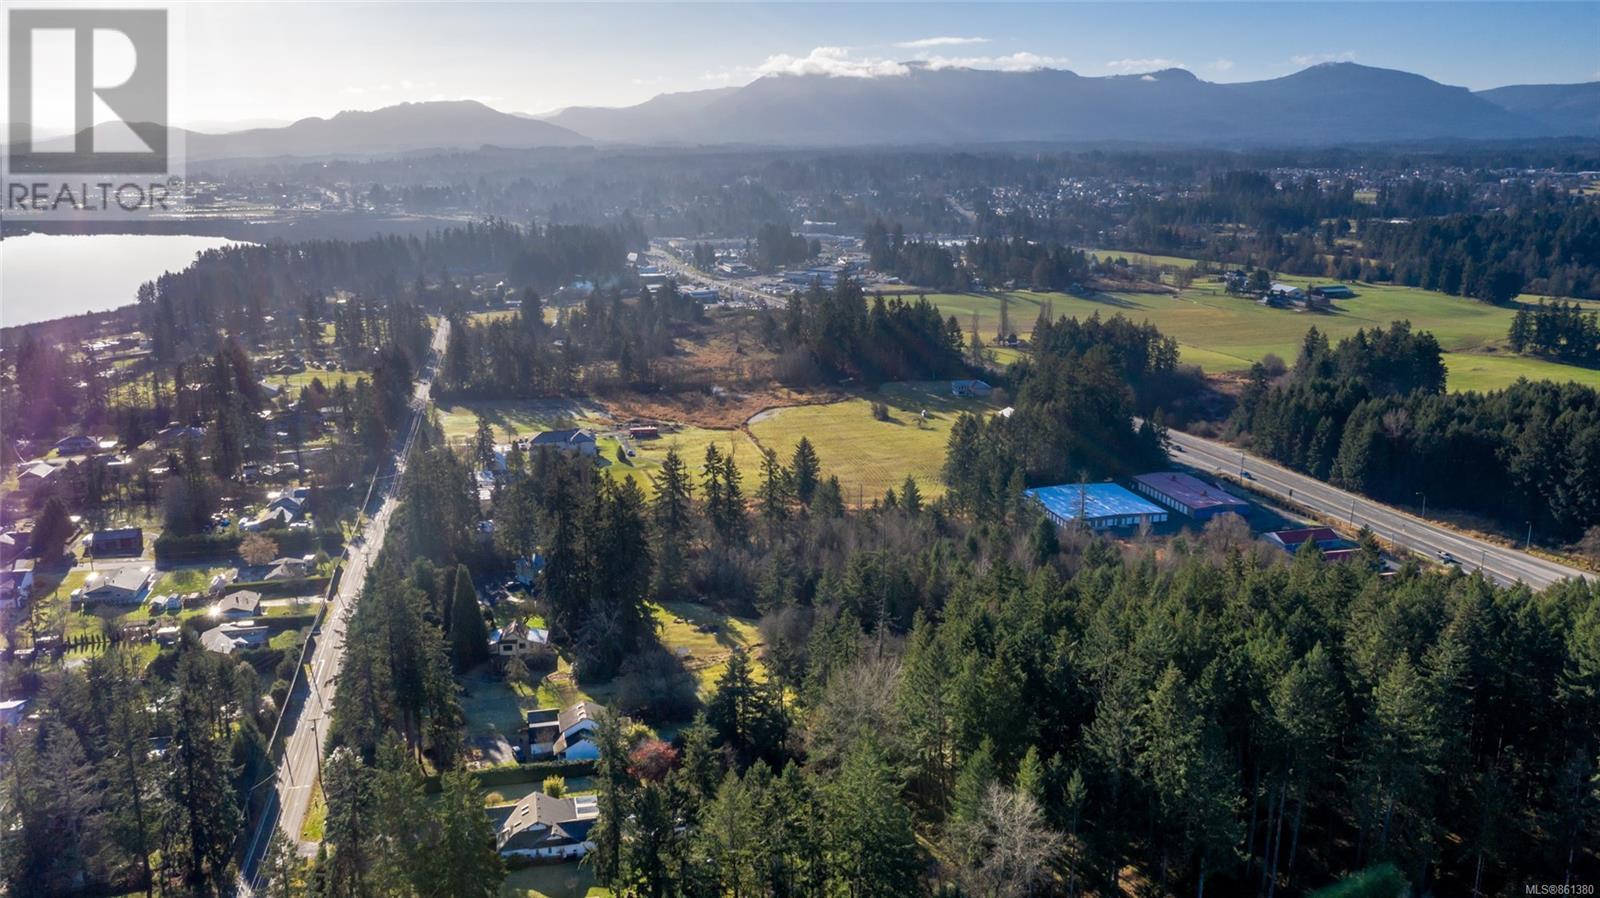 6790 Bell Mckinnon RdDuncan, British Columbia  V9L 6B7 - Photo 6 - 861380